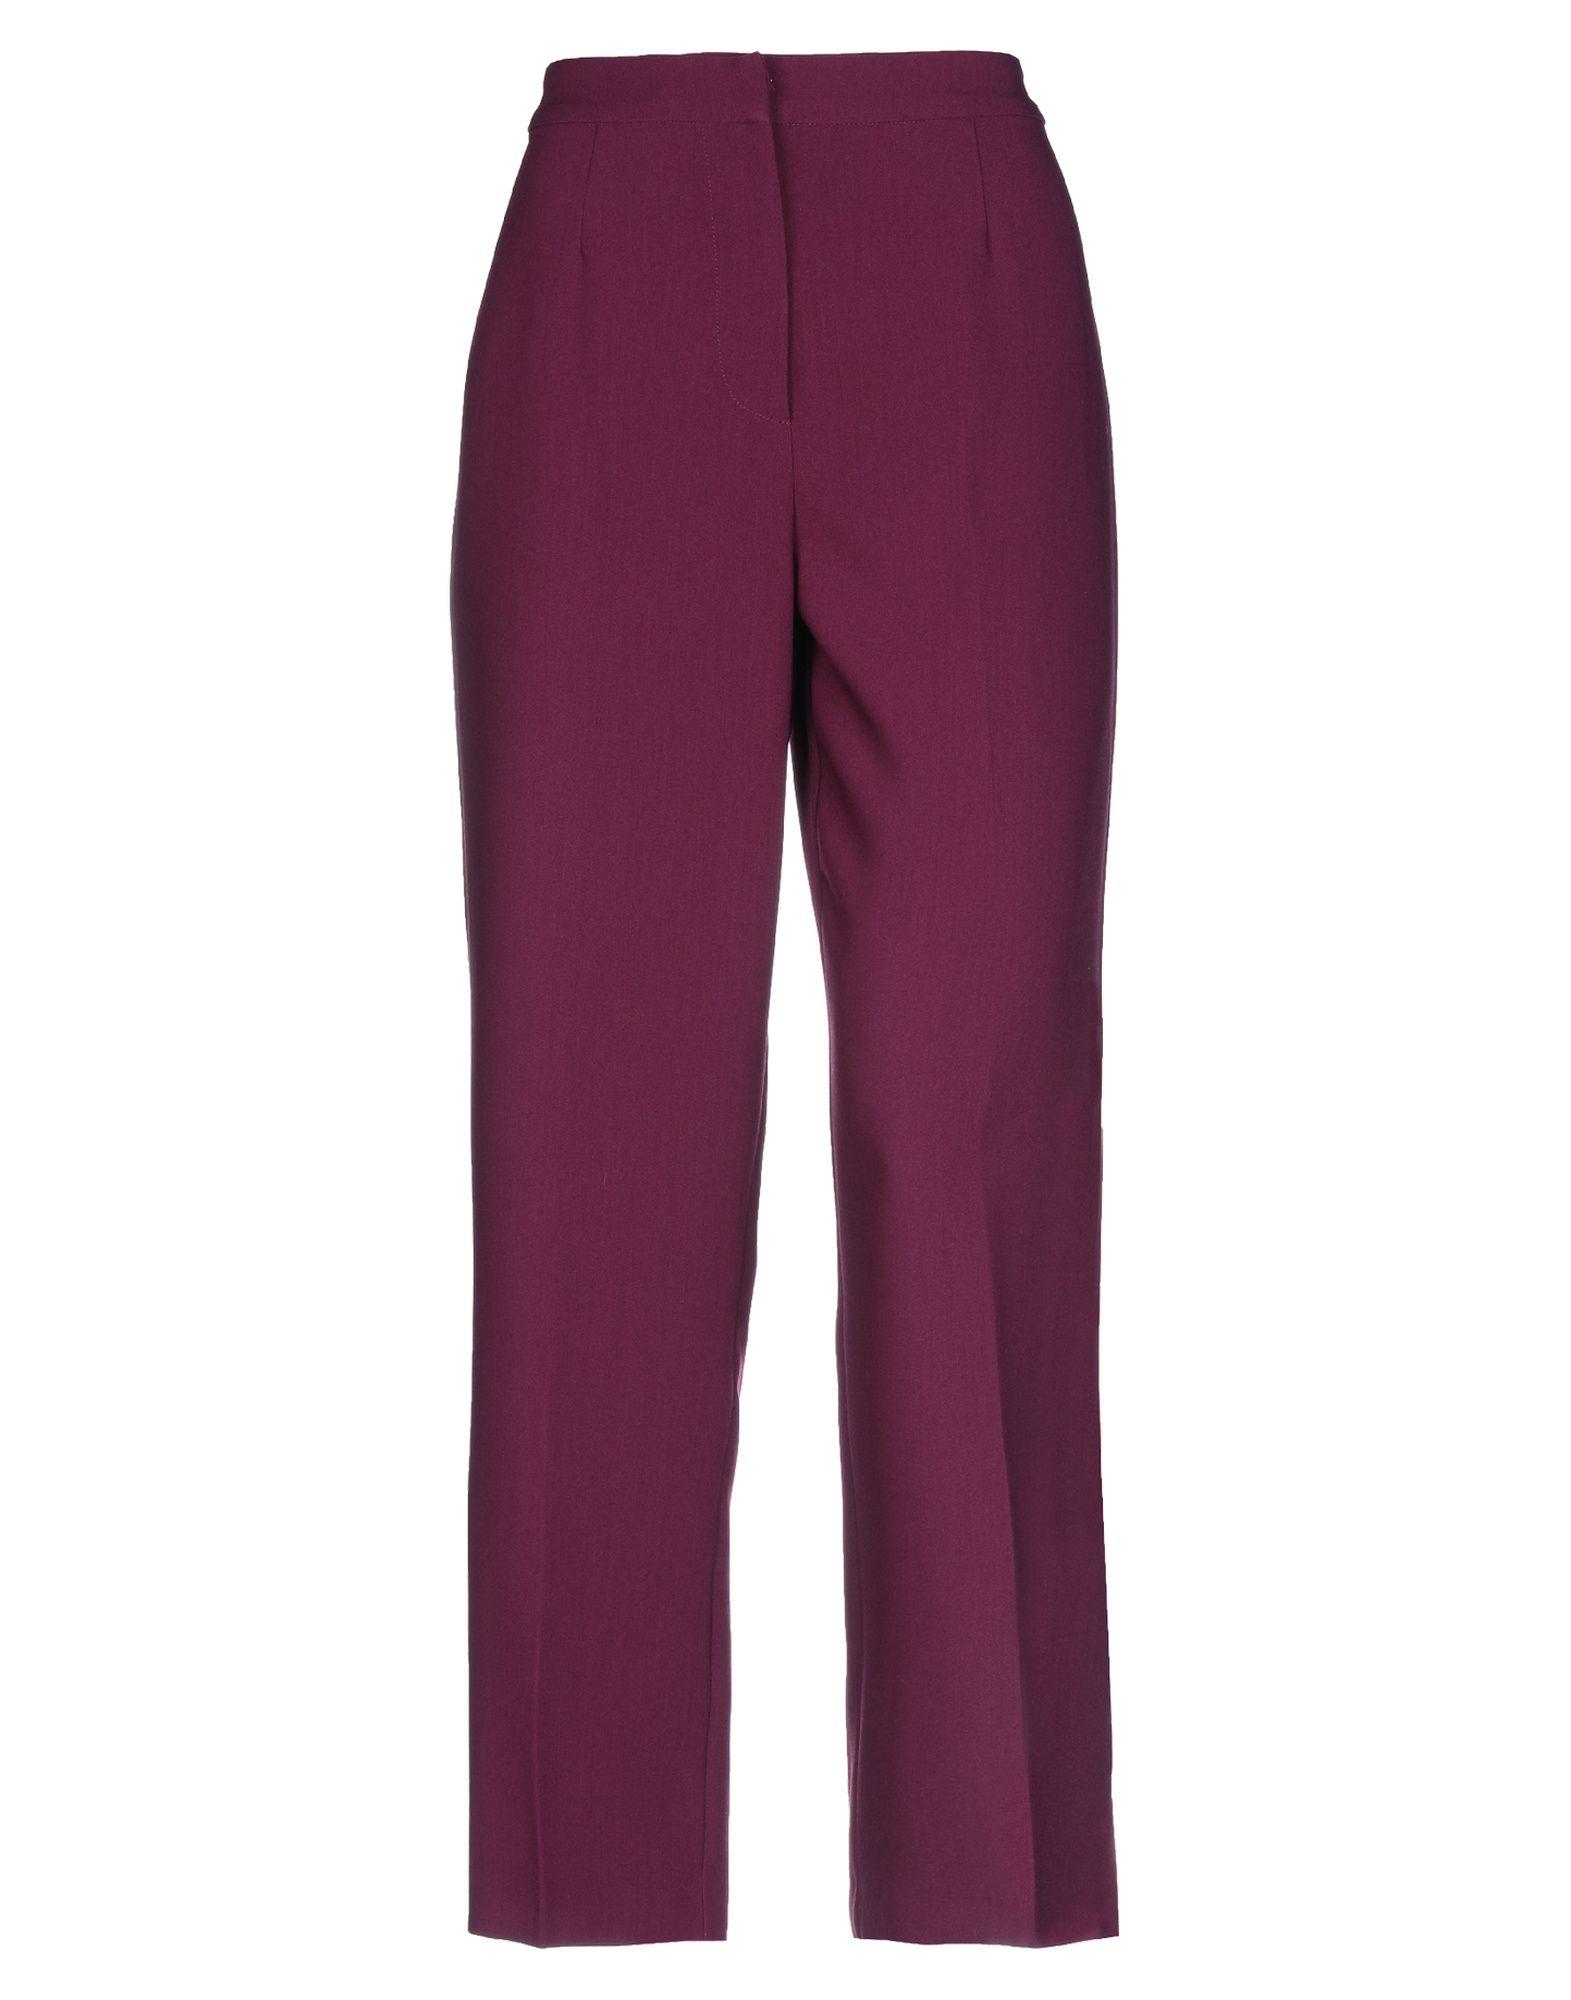 NICE THINGS by PALOMA S. Повседневные брюки цена и фото